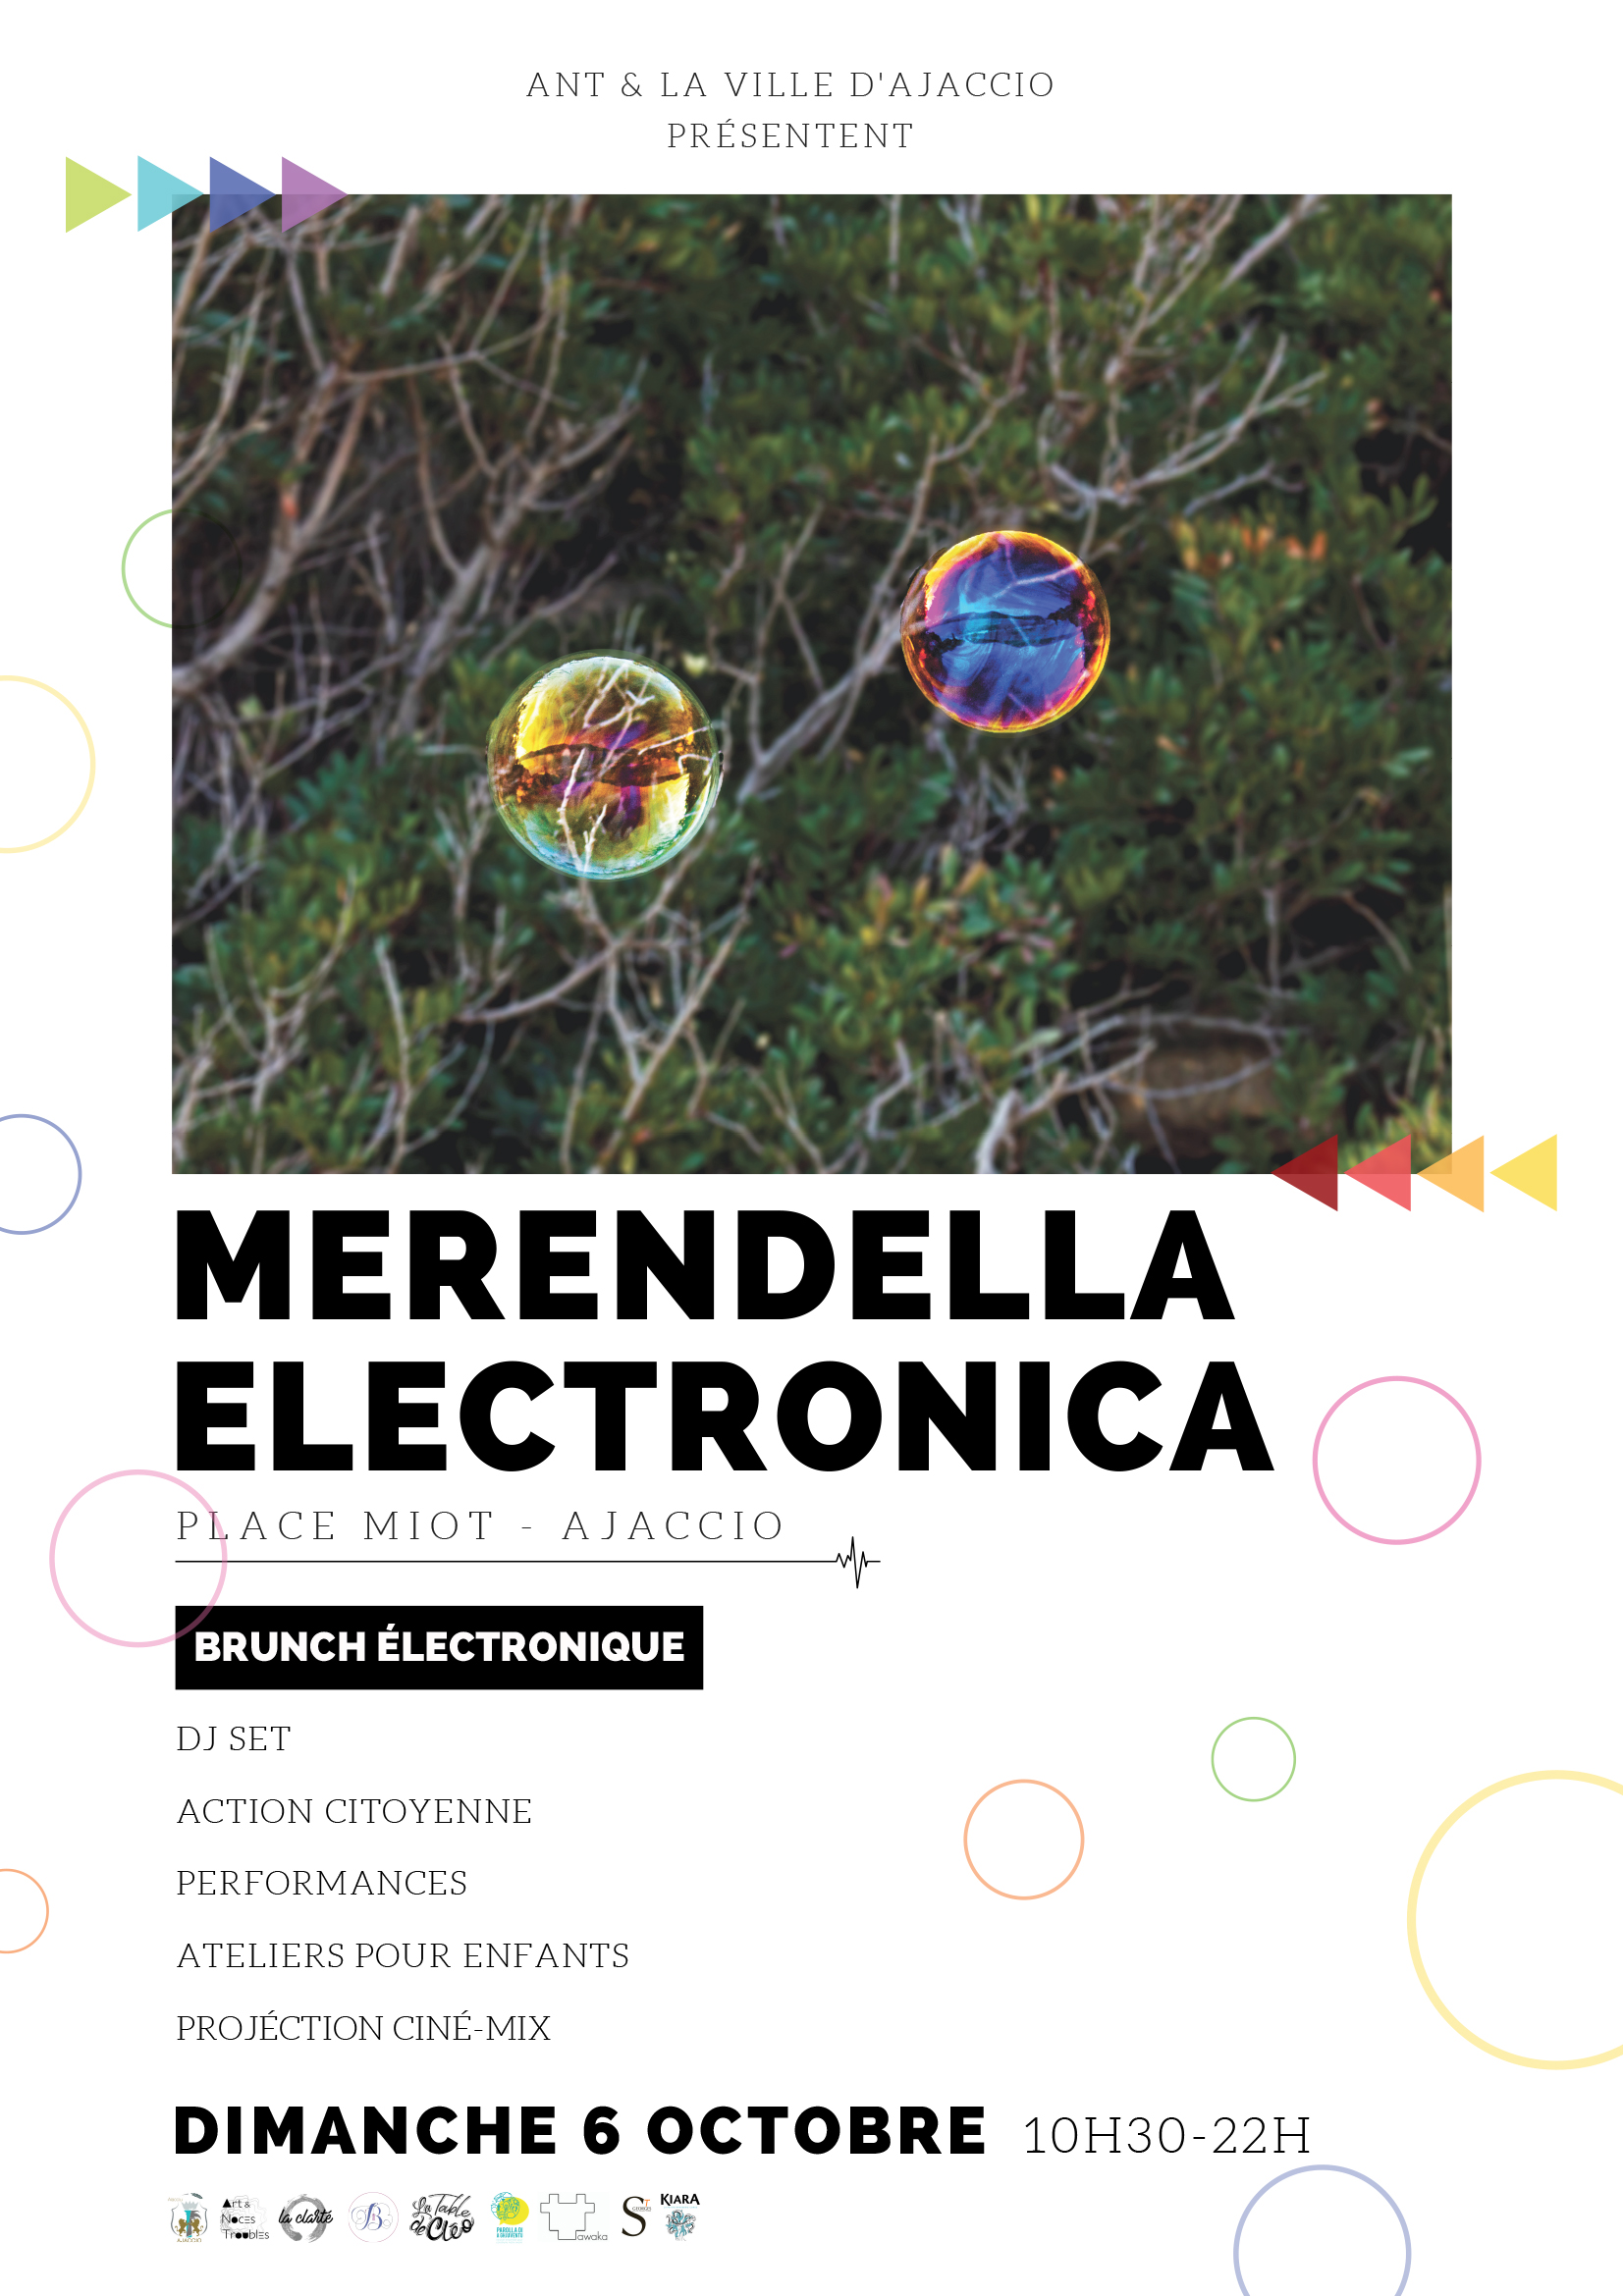 Dimanche 6 octobre / Merendella Electronica